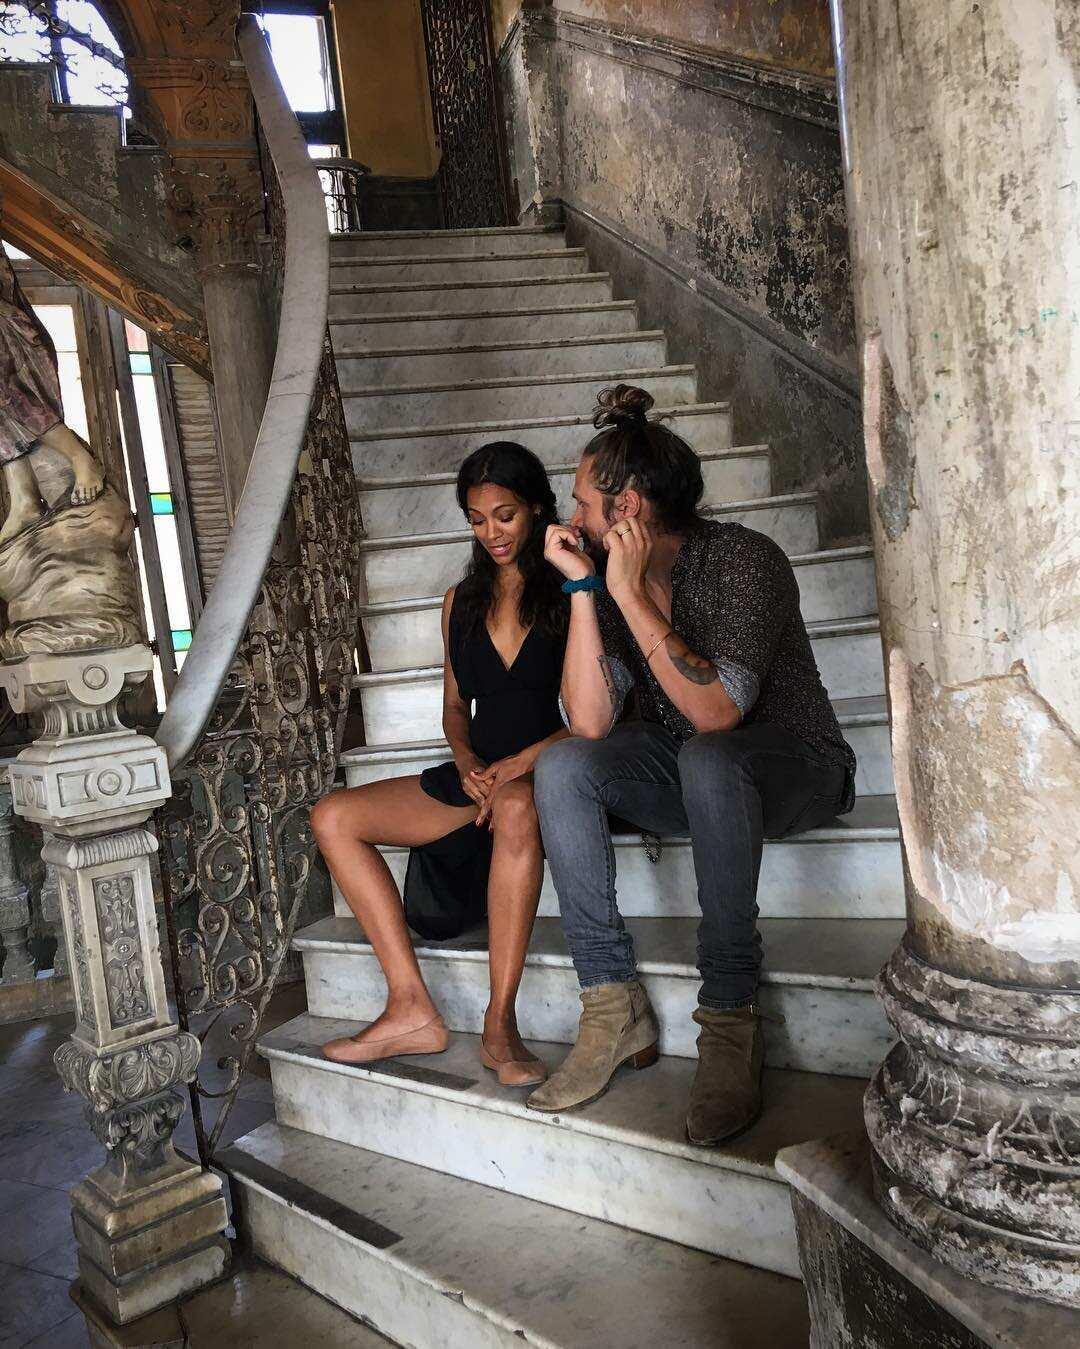 Zoe Saldana bio: net worth, kids, who is she married to ...